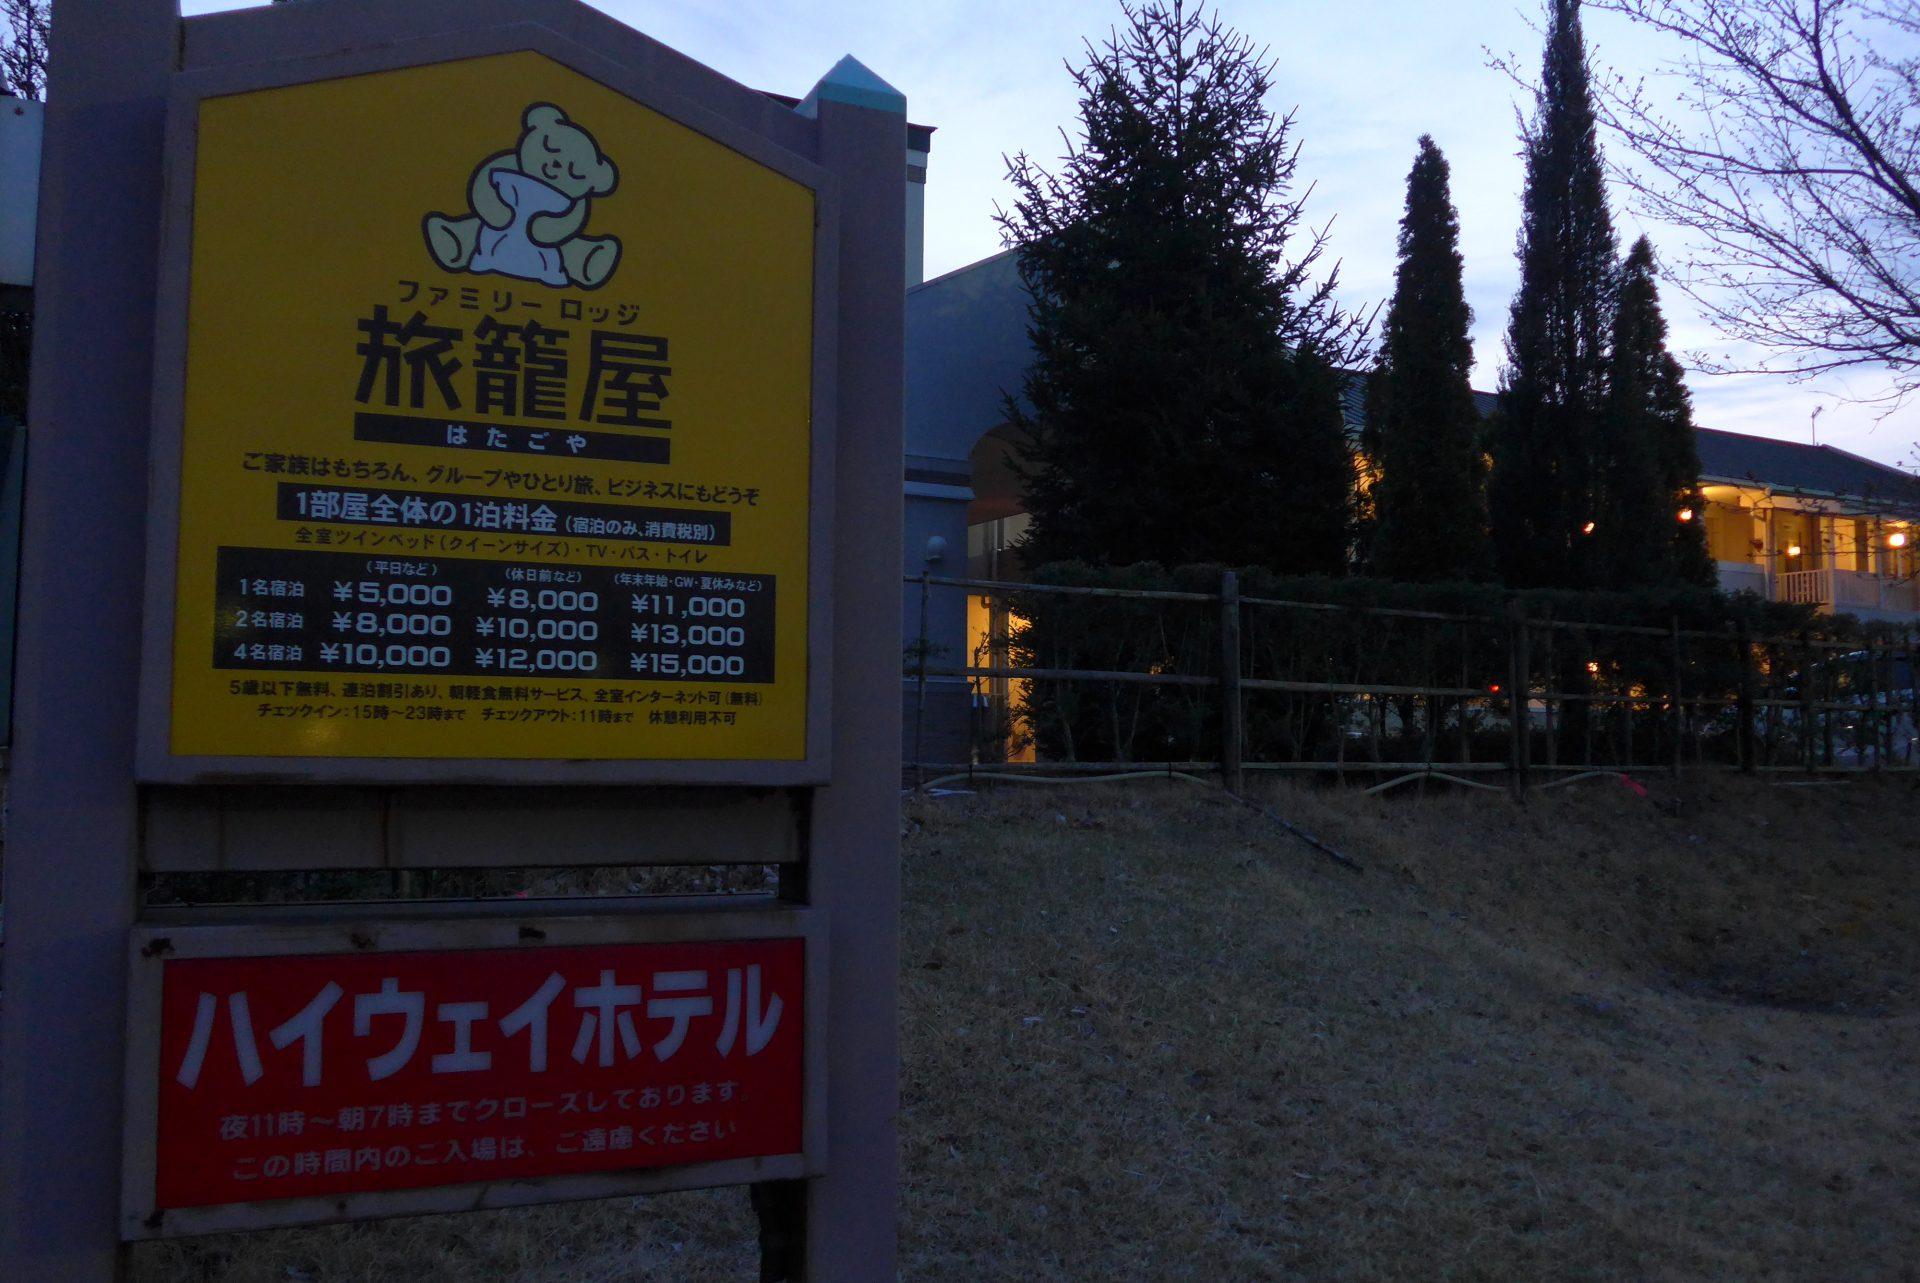 (K)宮島SA上りの車中泊〜騒音対策が肝!ハイウェイホテル利用も